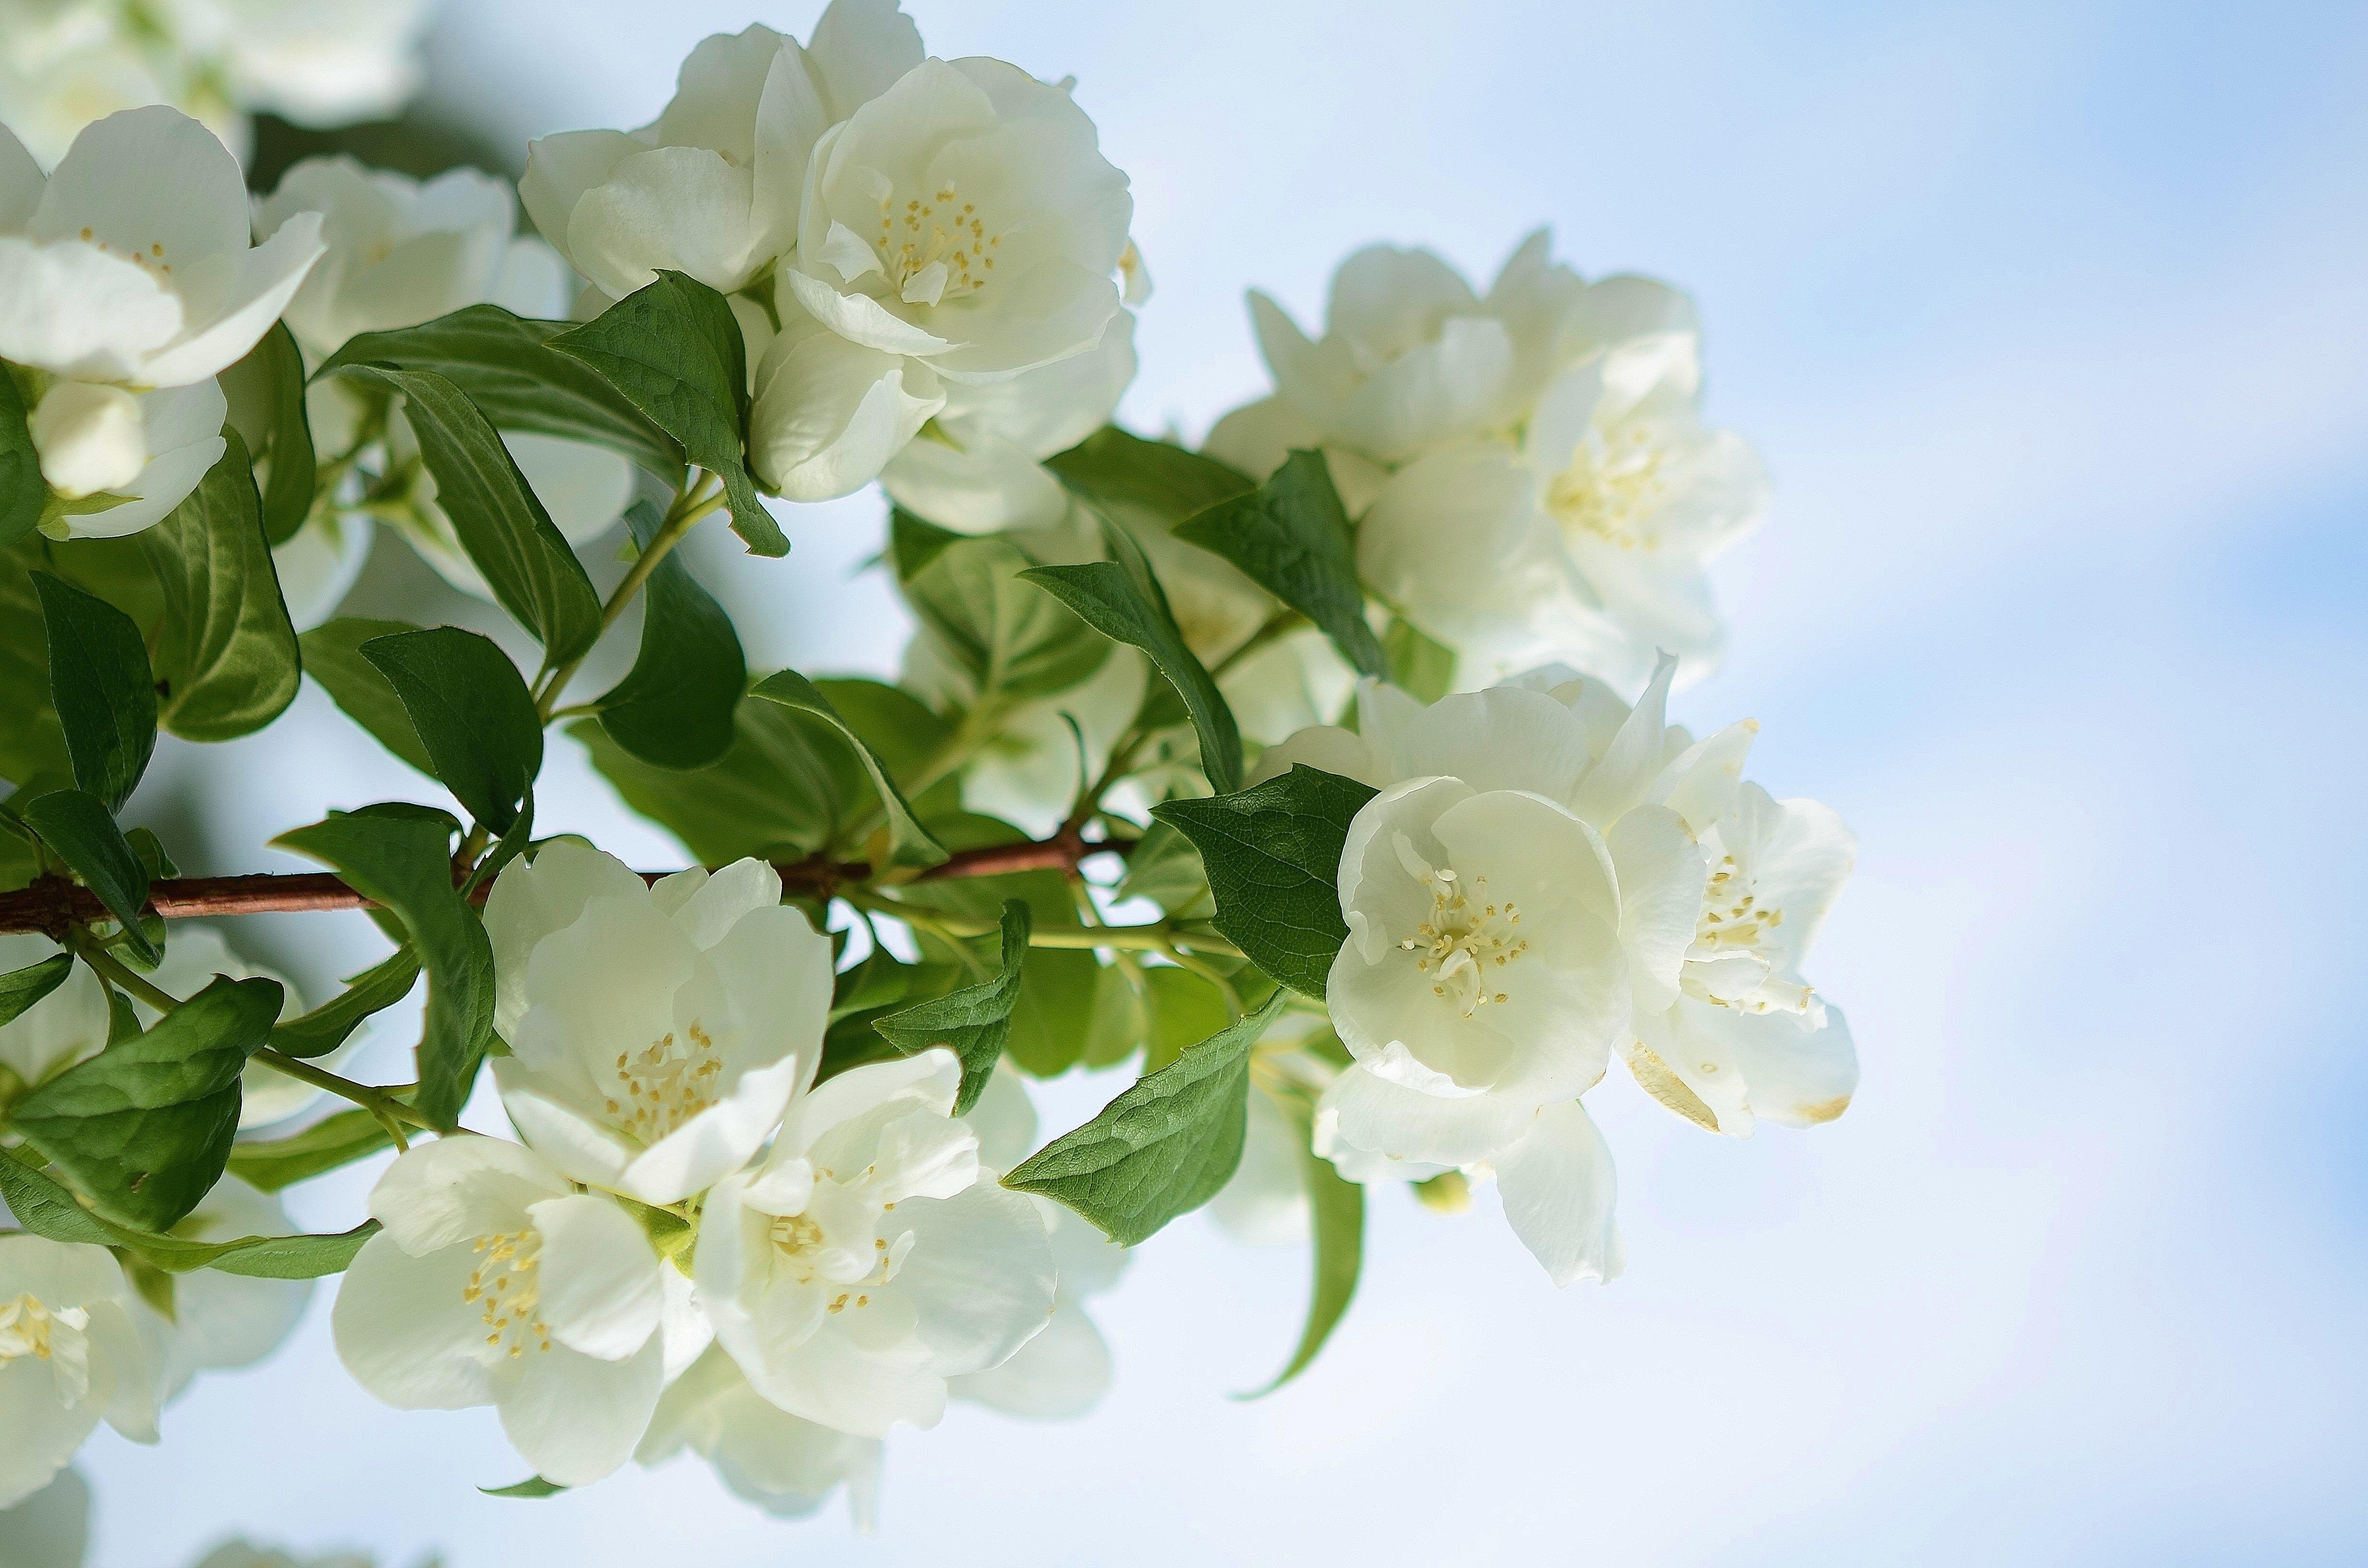 Чистяк весенний цветок бесплатно